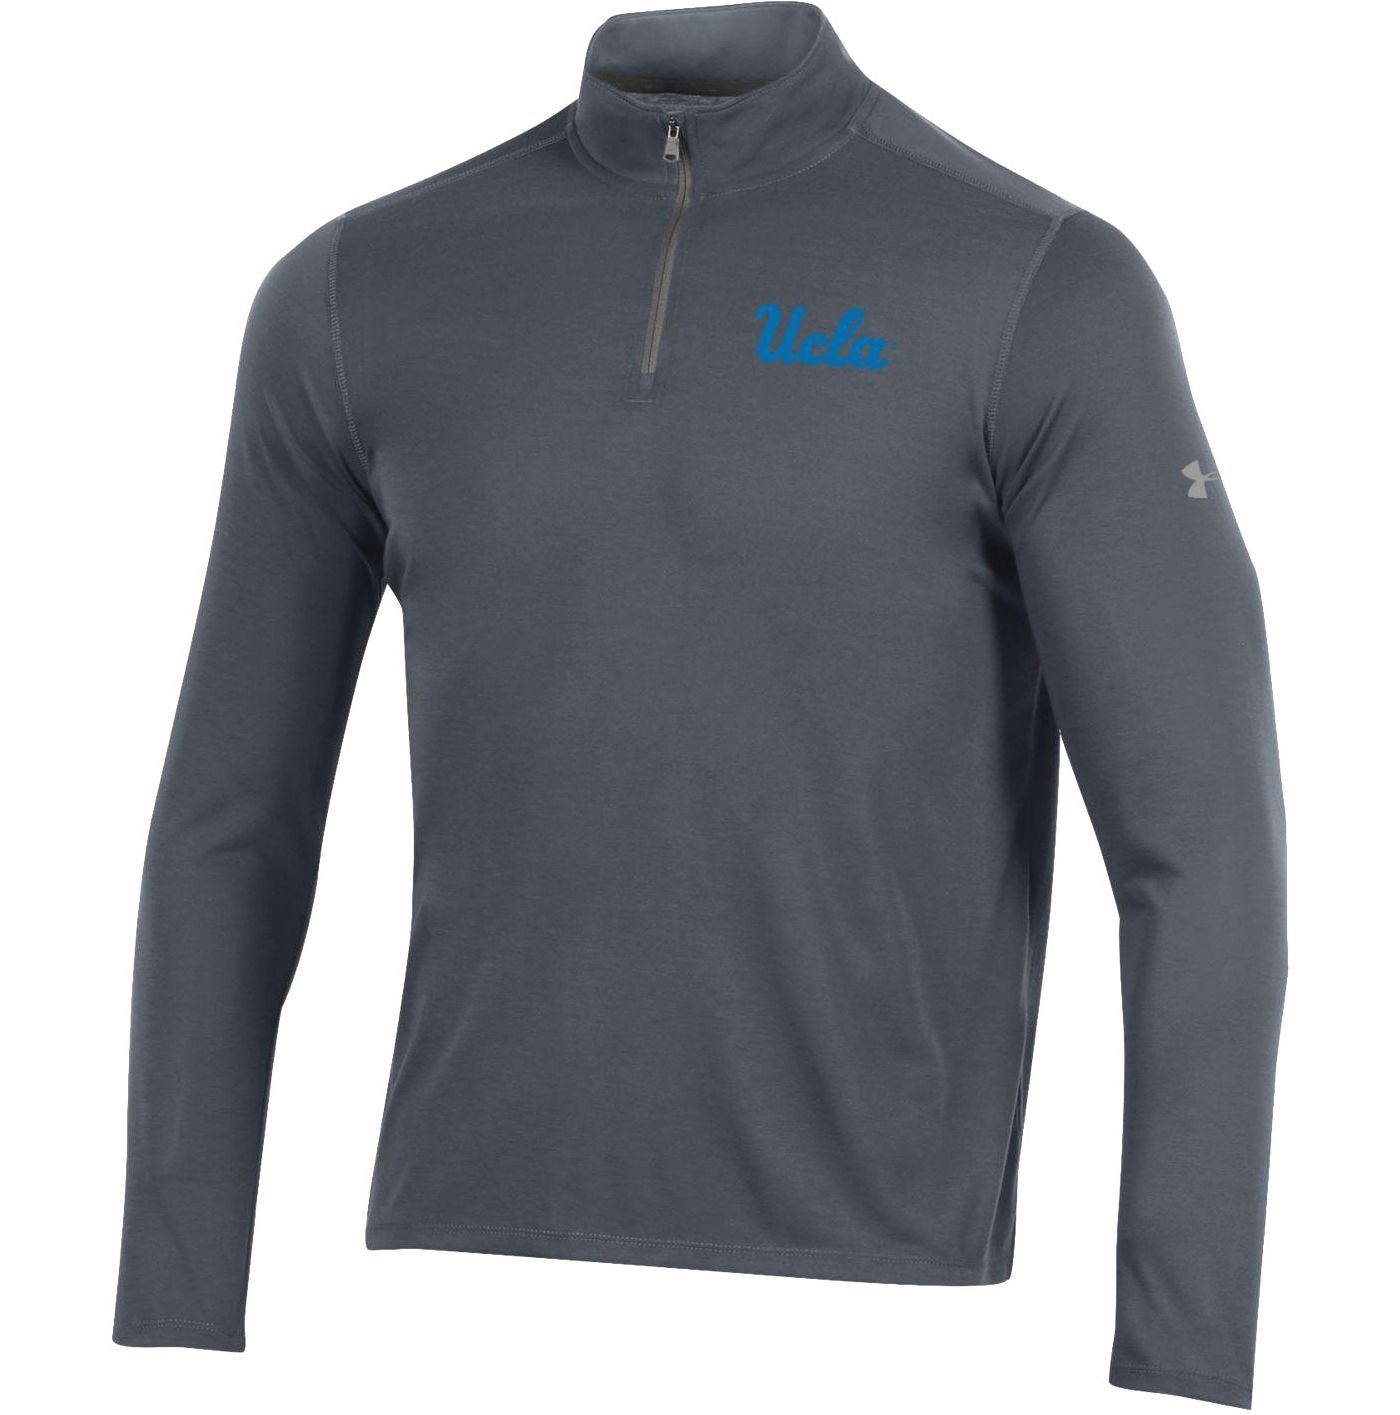 Under Armour Men's UCLA Bruins Grey 'Chip Kelly' Threadborne Quarter-Zip Shirt